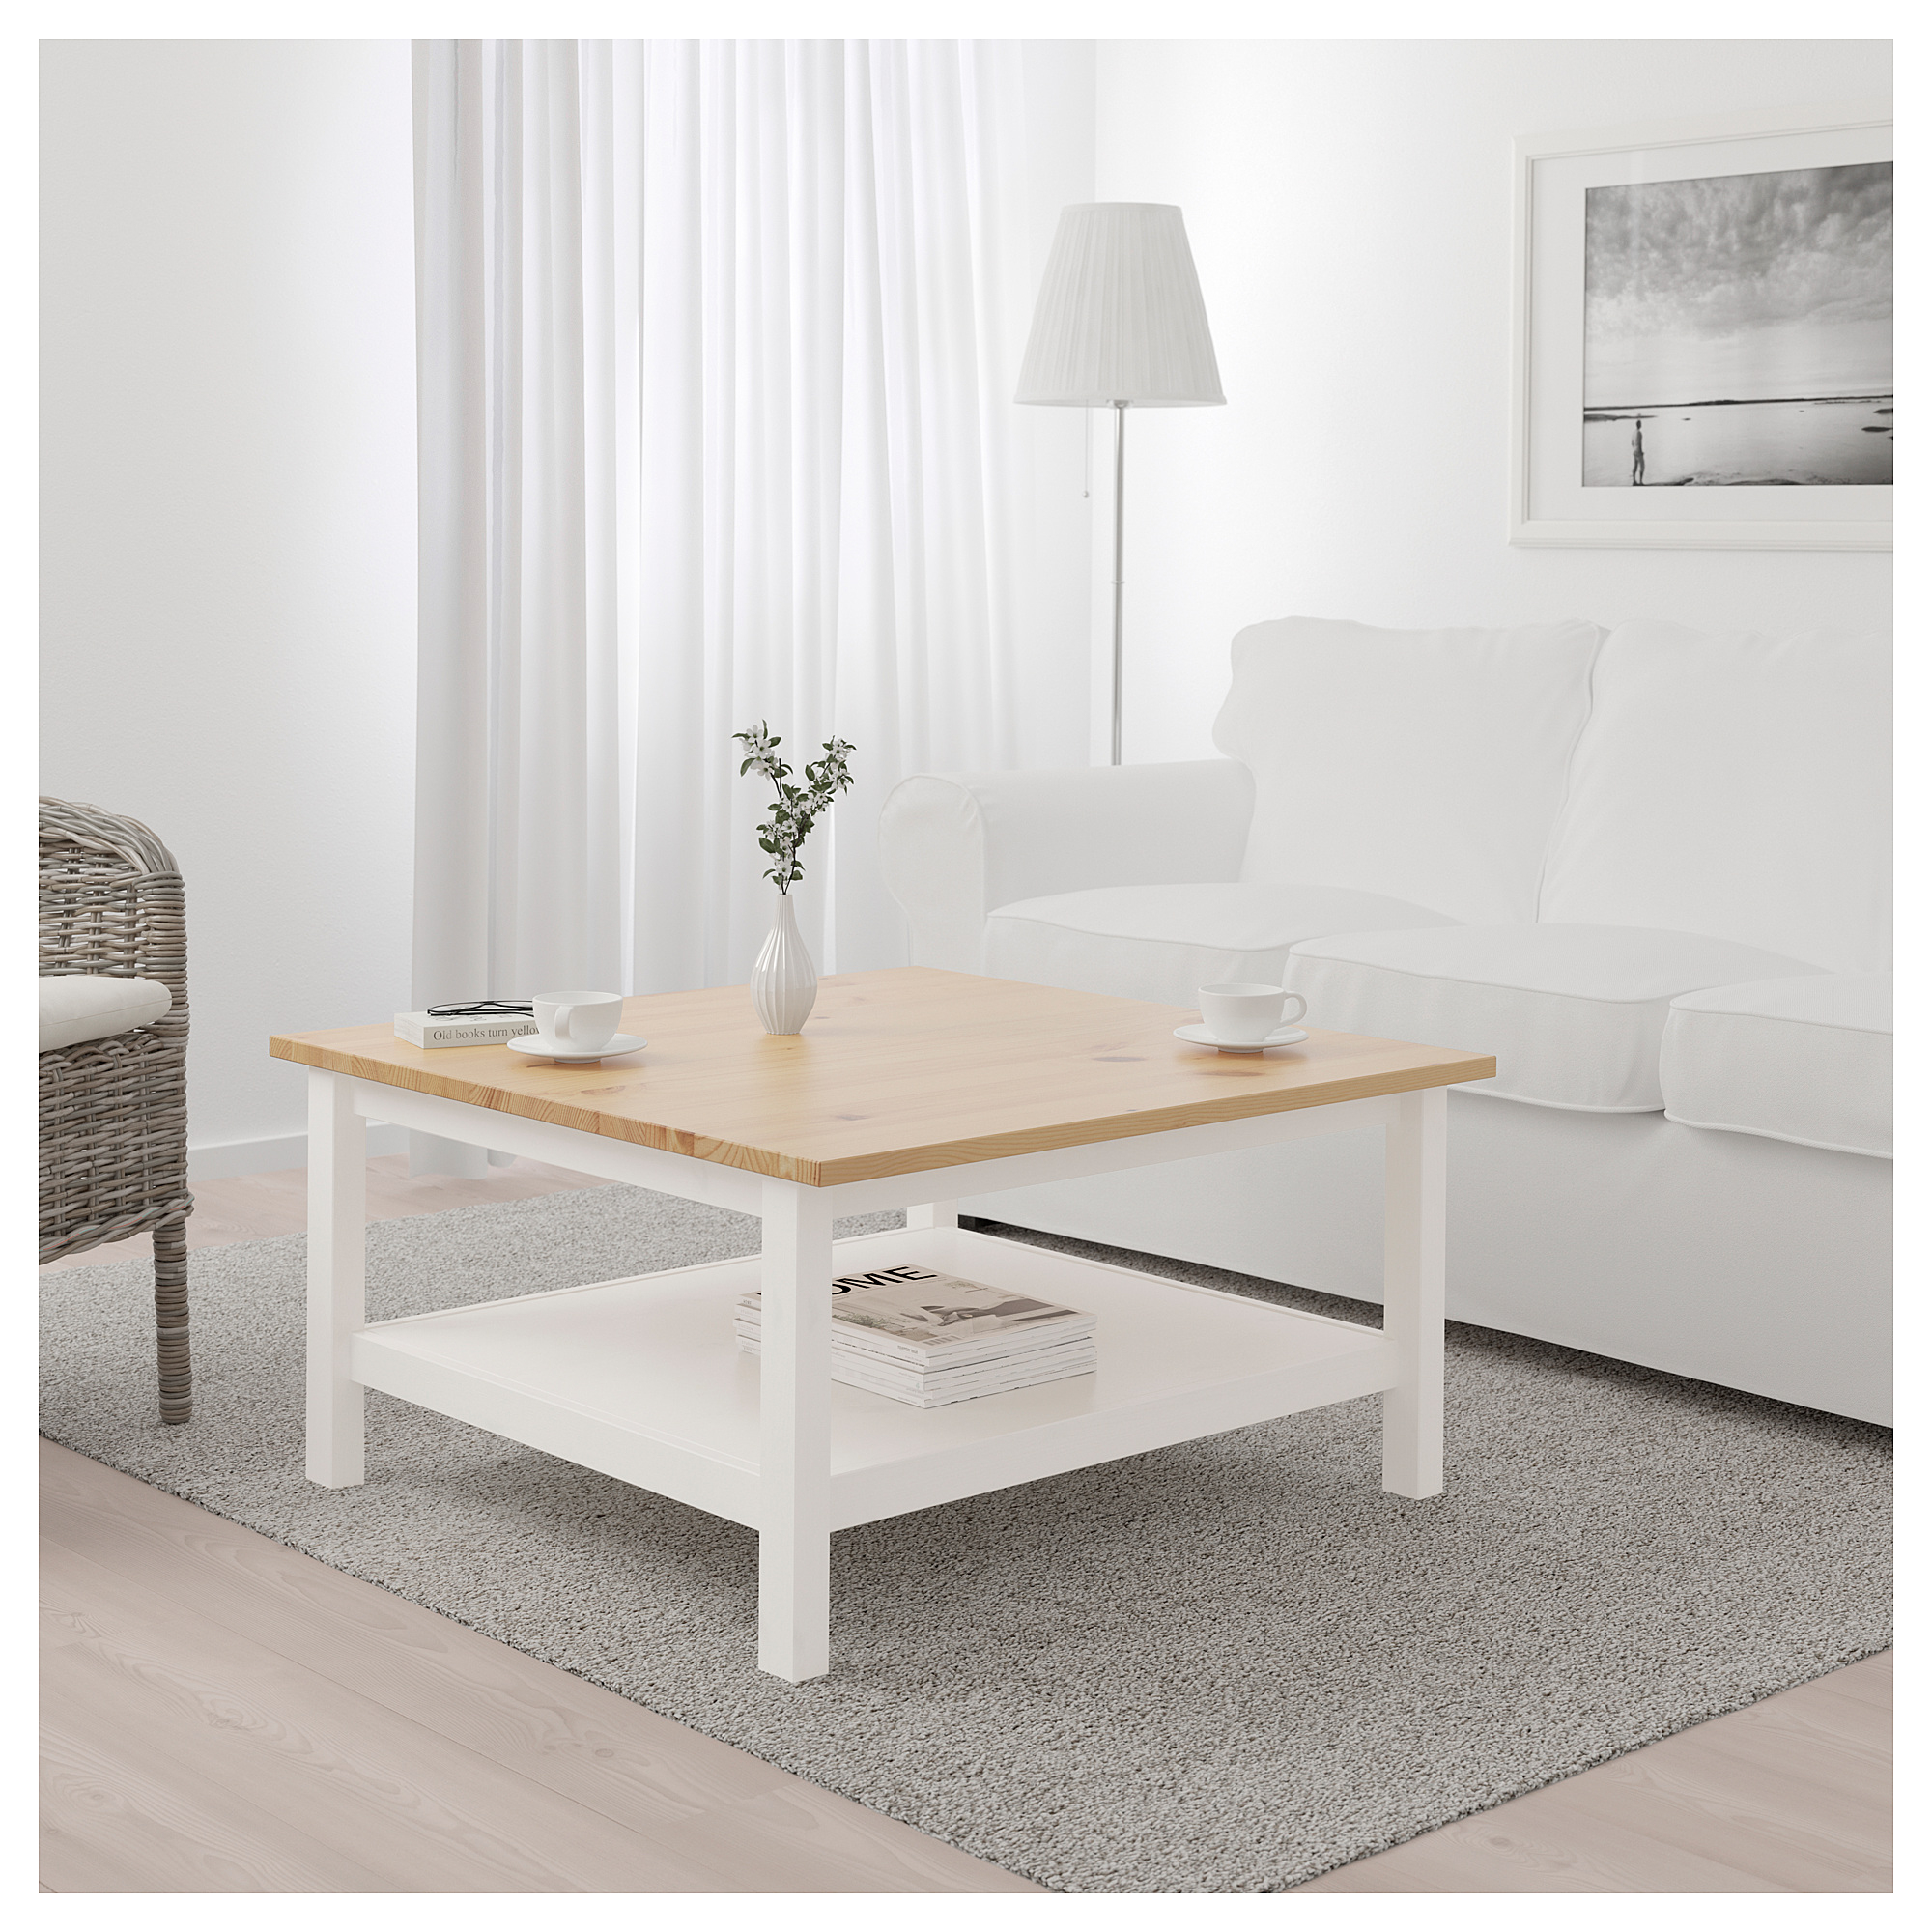 Ikea - Hemnes Coffee Table White Stain, Light Brown | Table ... concernant Table Basse De Jardin Ikea